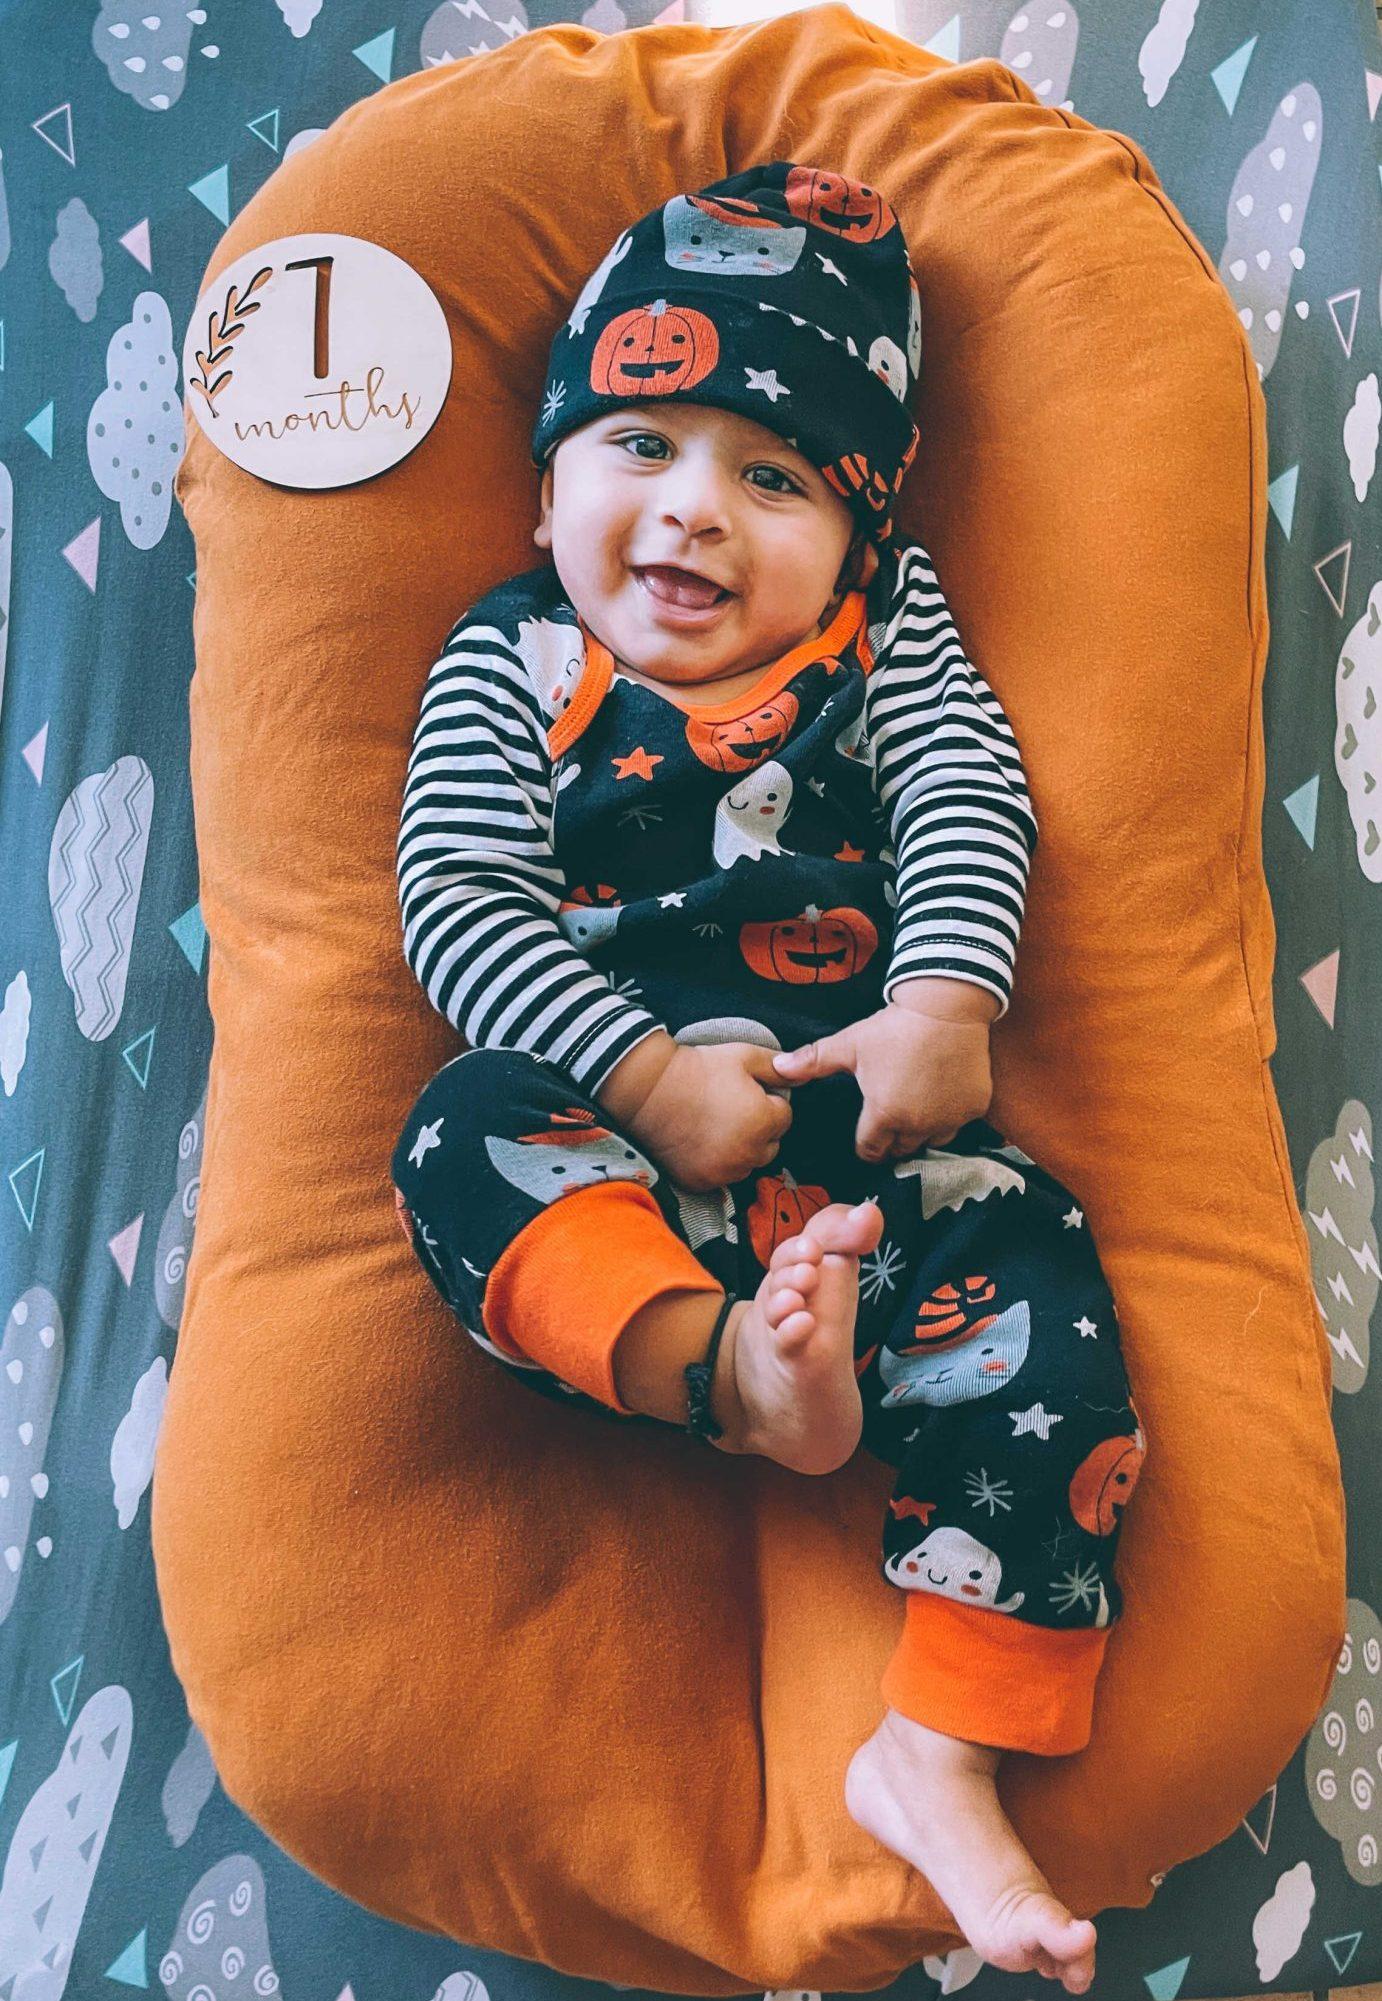 Baby v 7 months birthday update 3